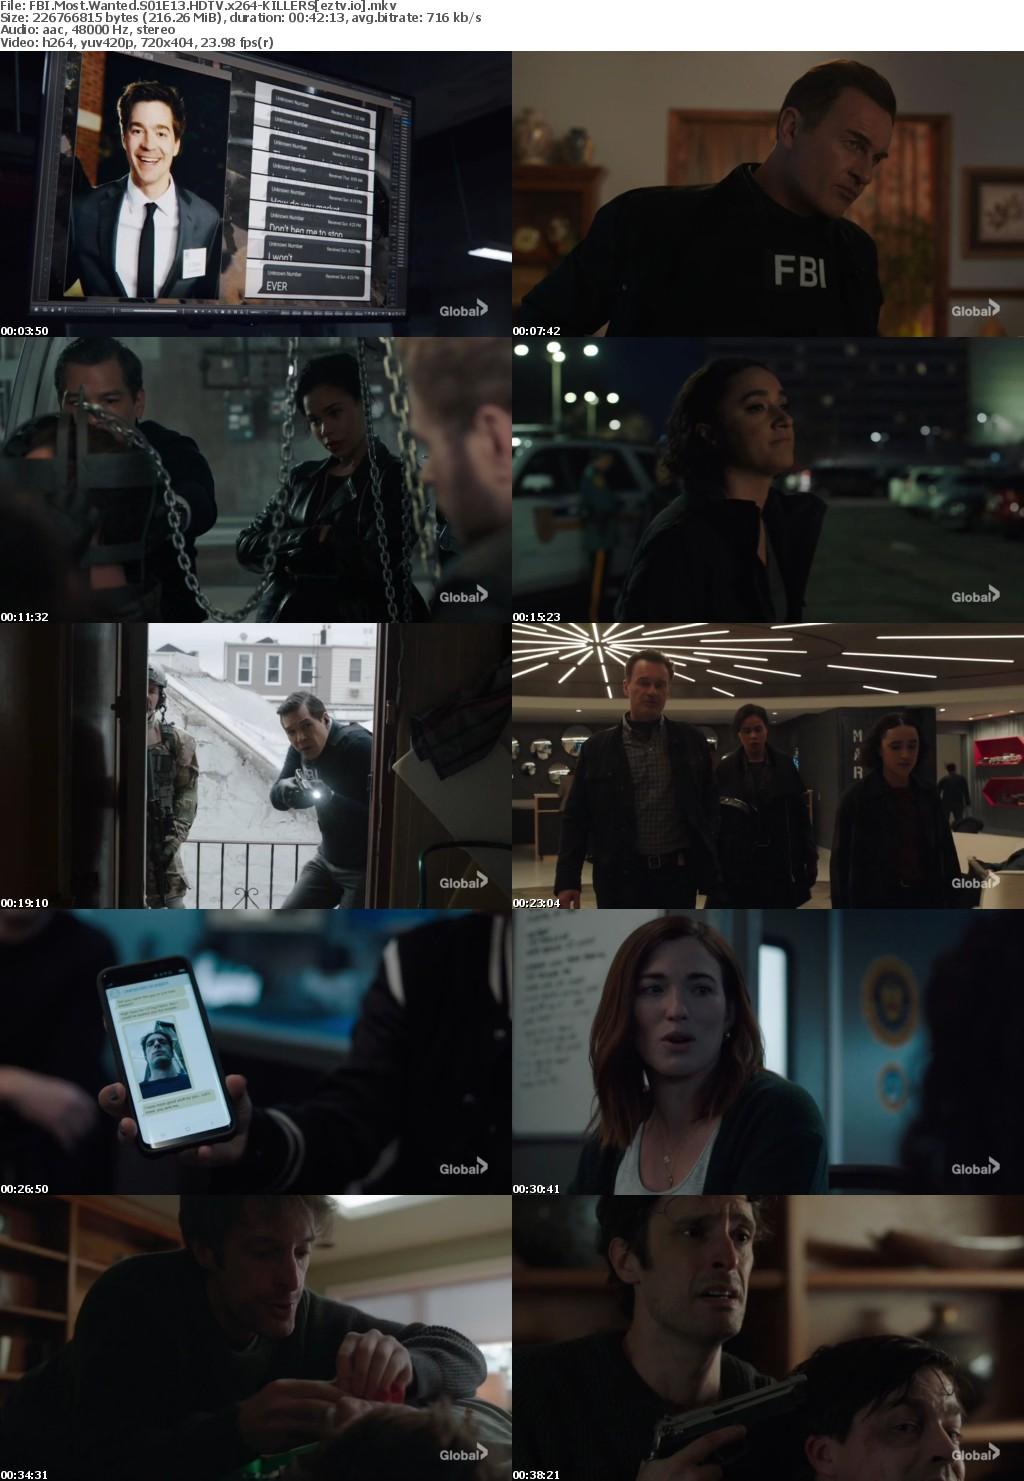 FBI Most Wanted S01E13 HDTV x264-KILLERS